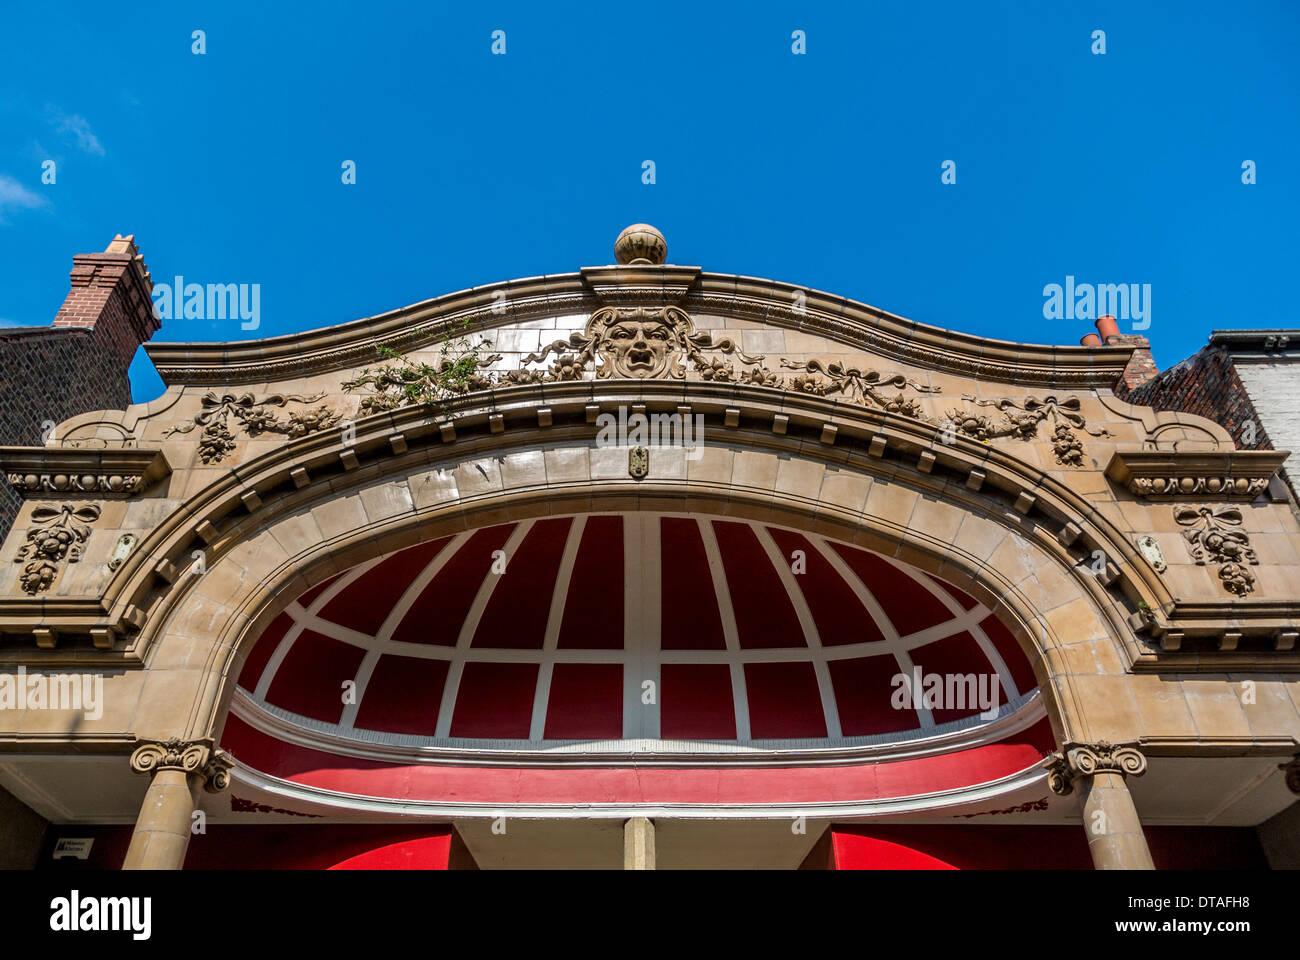 Ornate frontage of McDonalds Furniture shop, Fossgate, York. - Stock Image